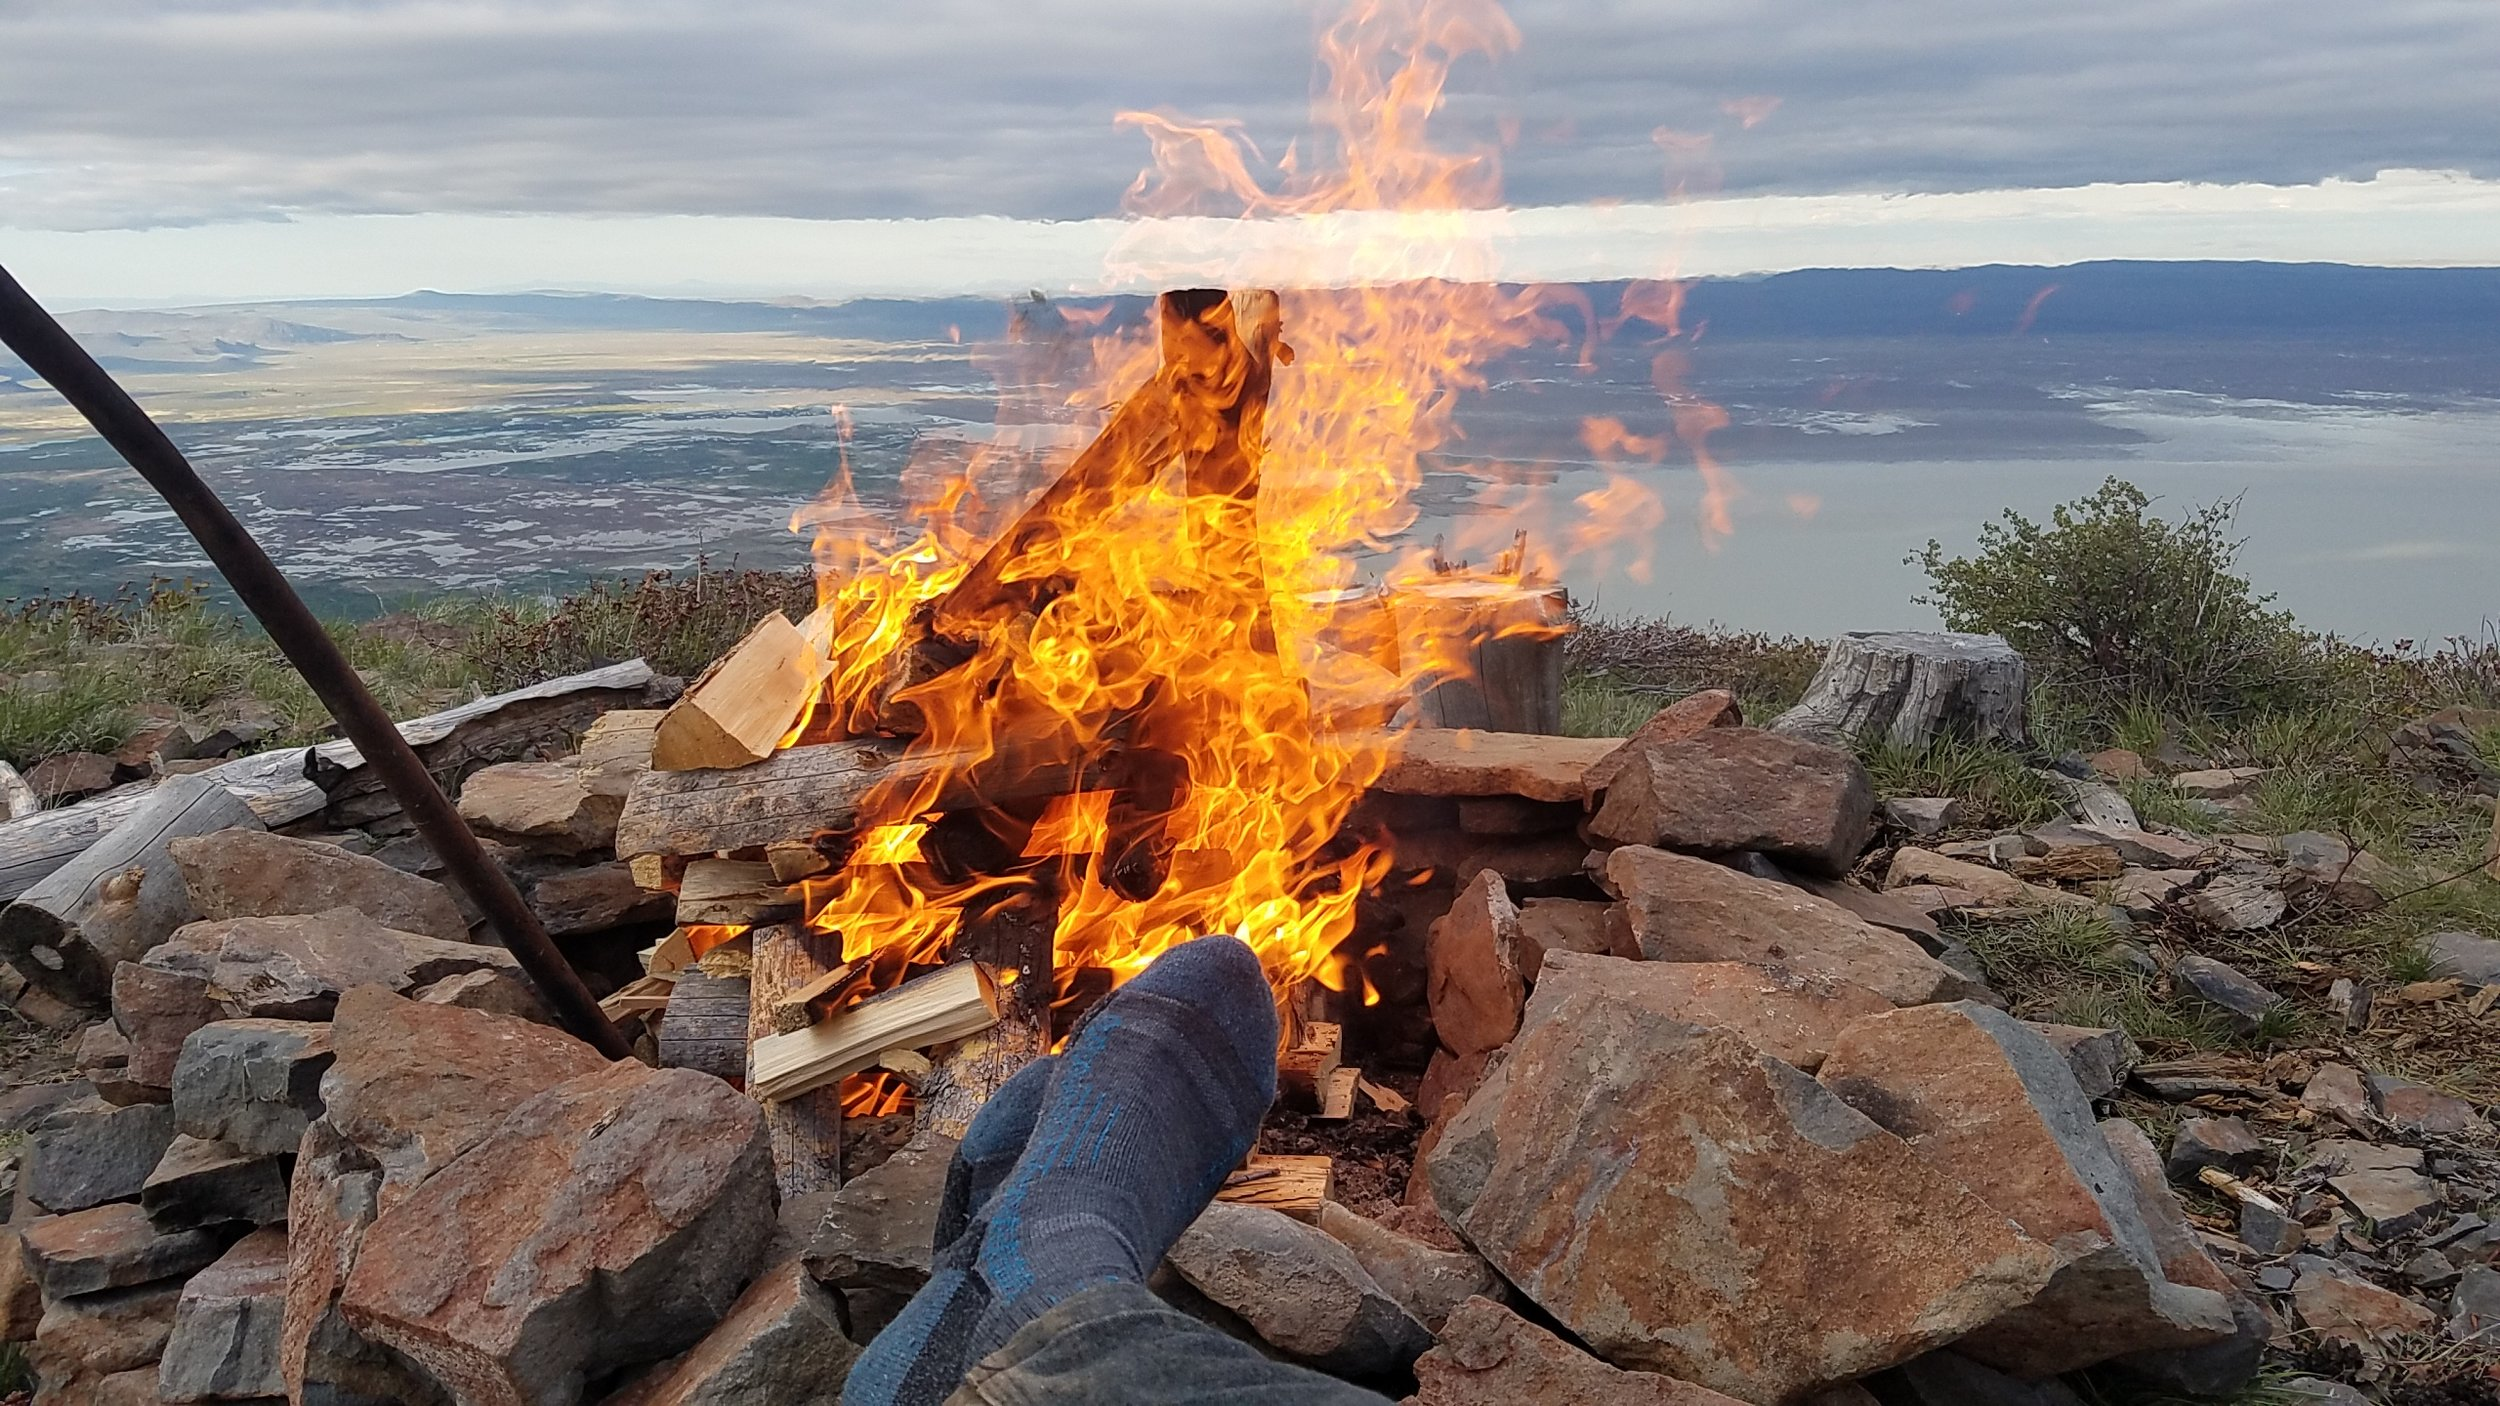 fire-fireplace-camping.jpg